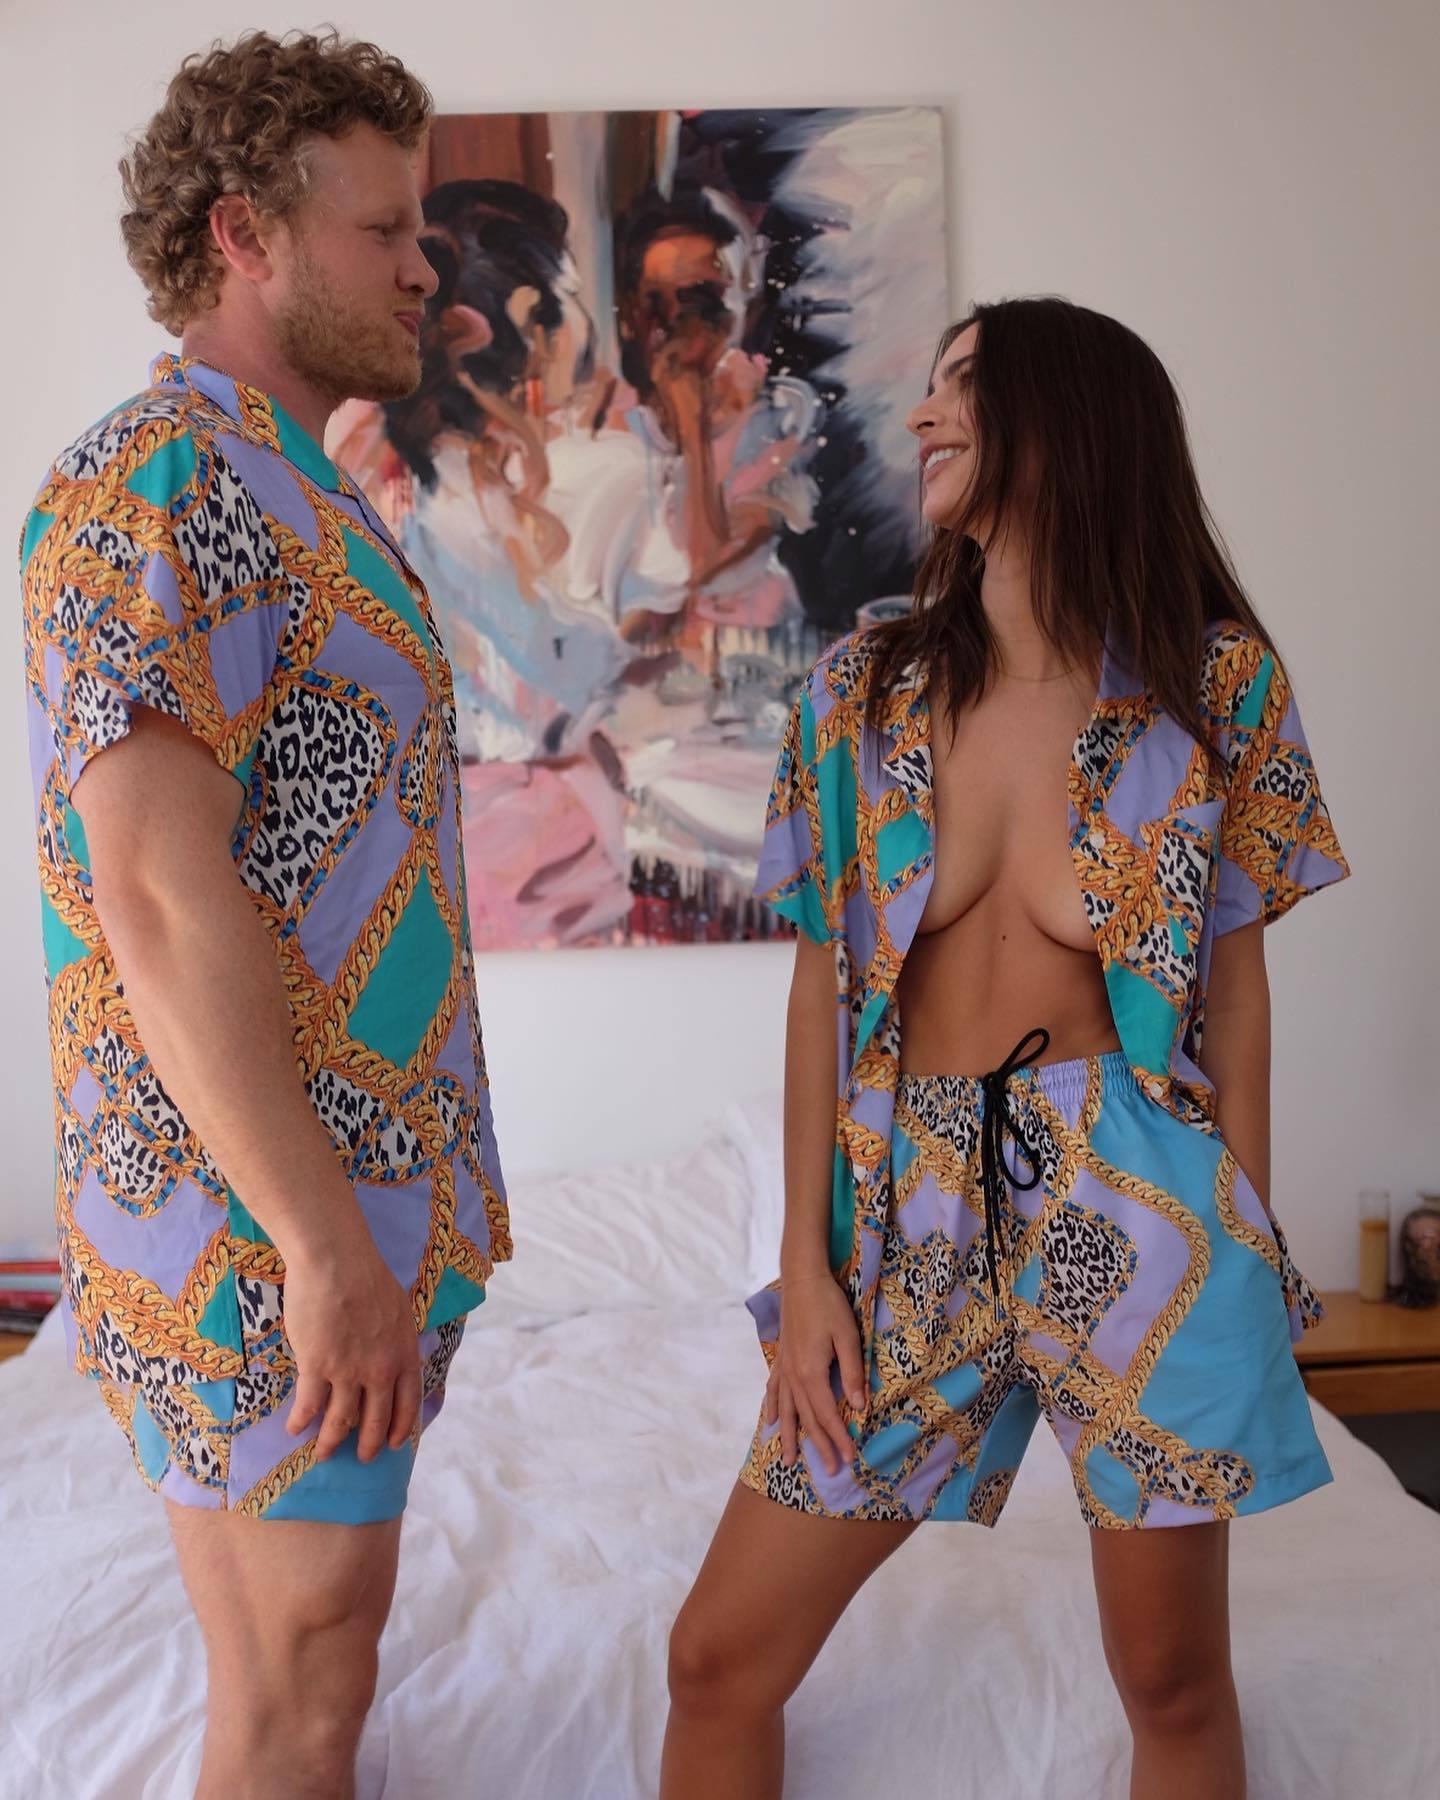 Emily Ratajkowski – Perfect Boobs In Sexy Braless Photoshoot For Inamorata Collection 0004